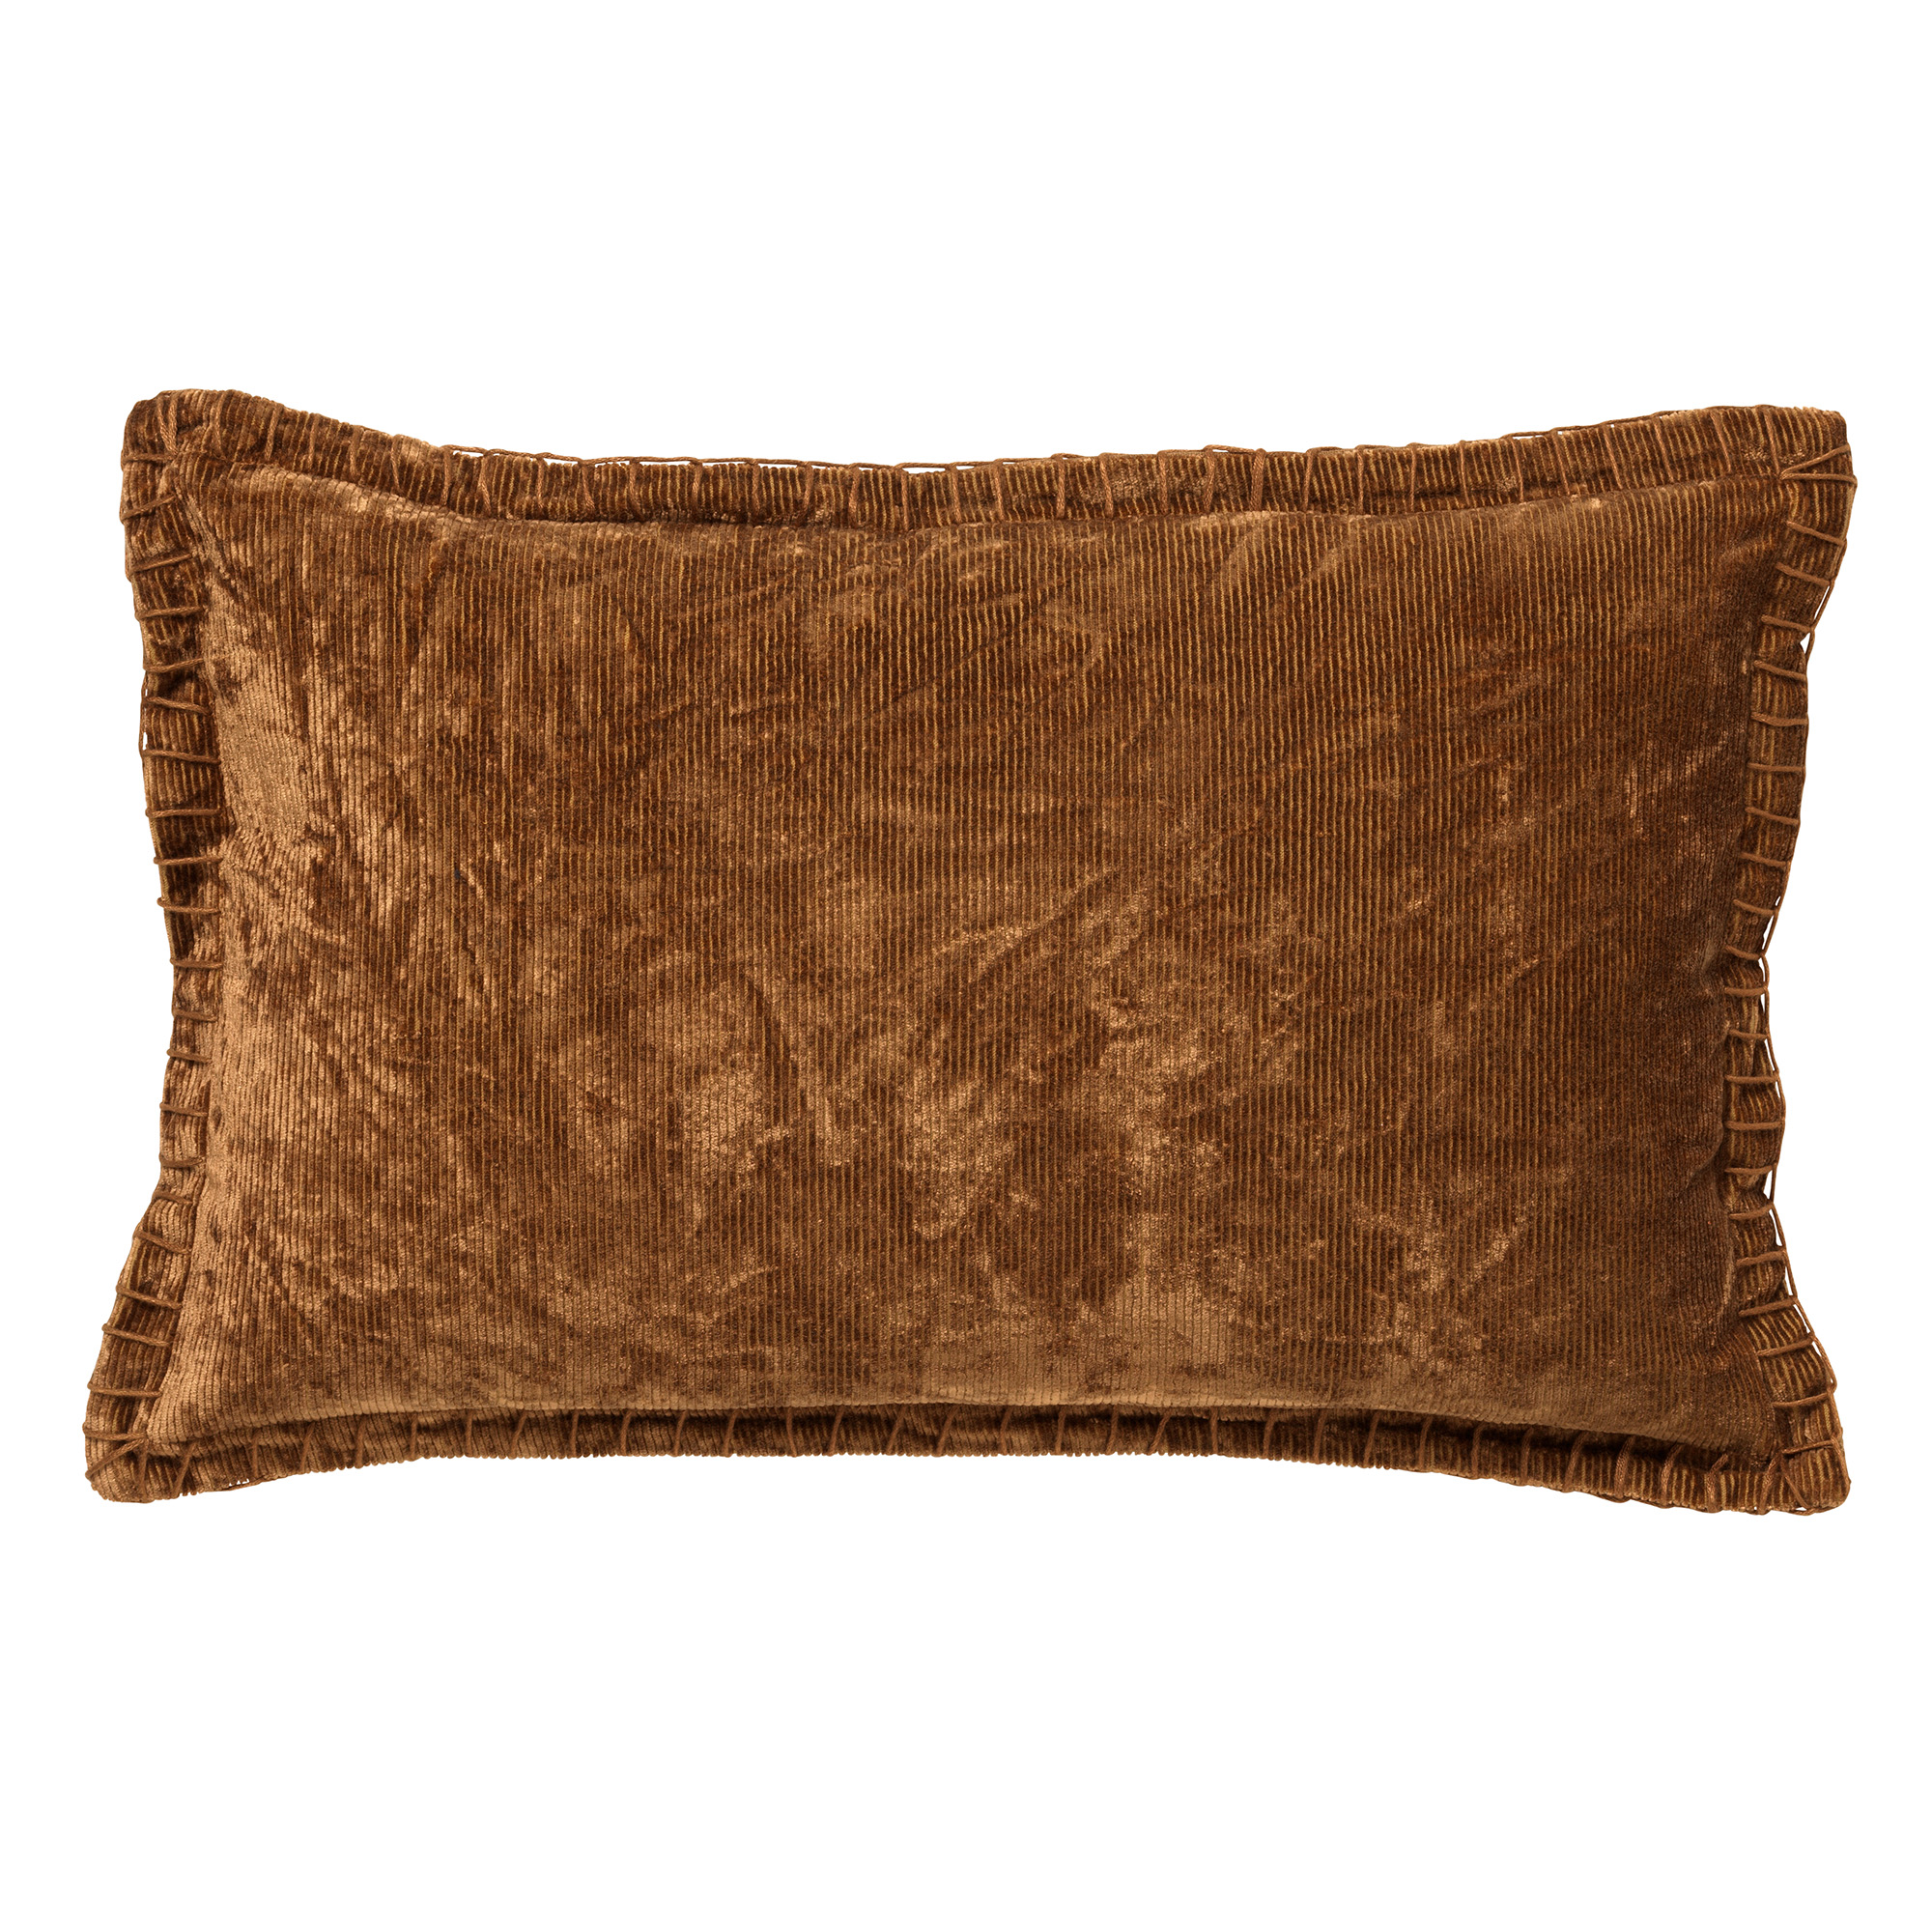 REBEL - Kussenhoes velvet 30x50 cm Tobacco Brown